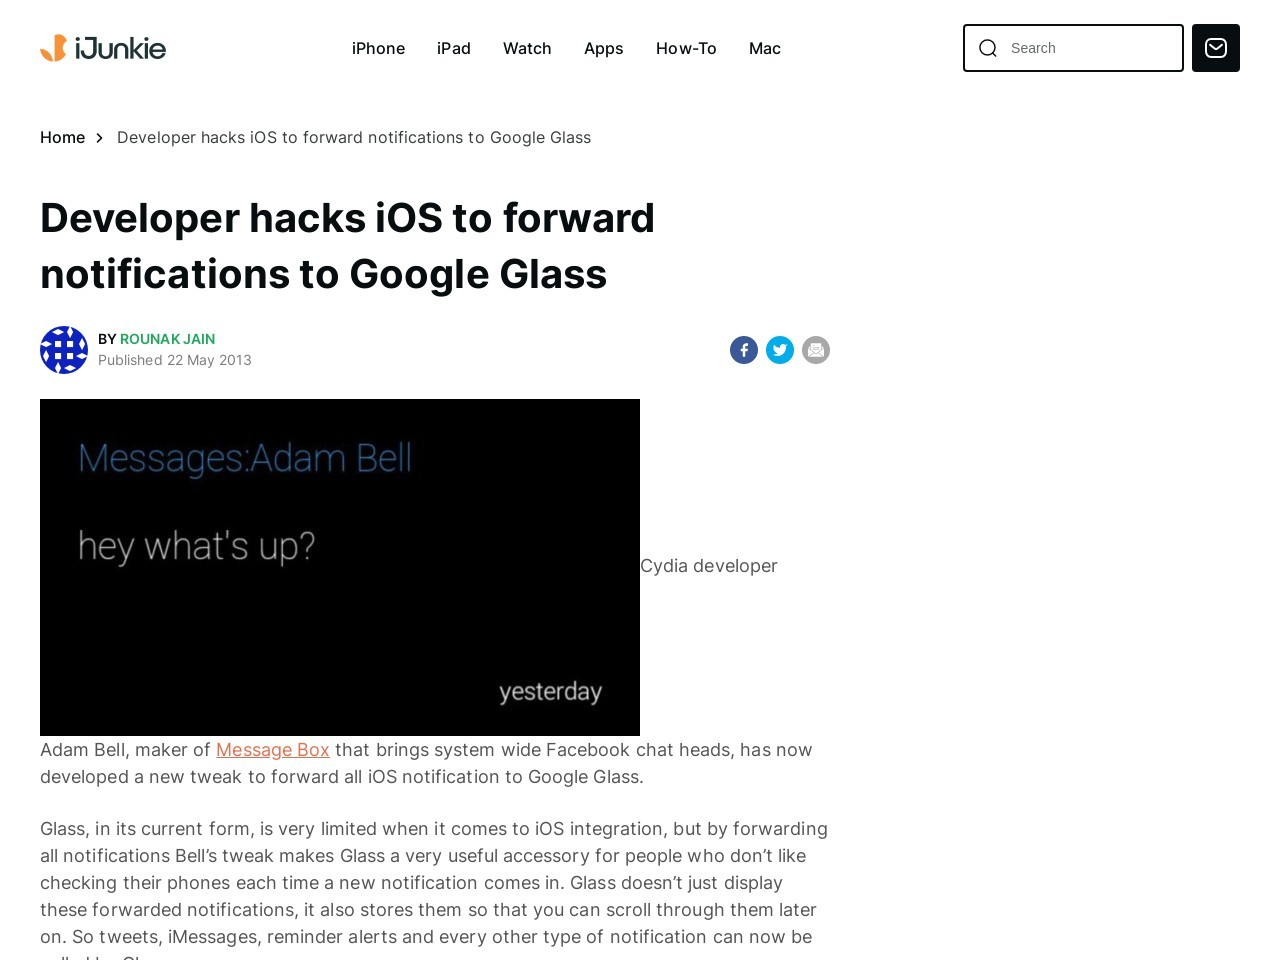 Developer tweaks iOS to forward notifications to Google Glass